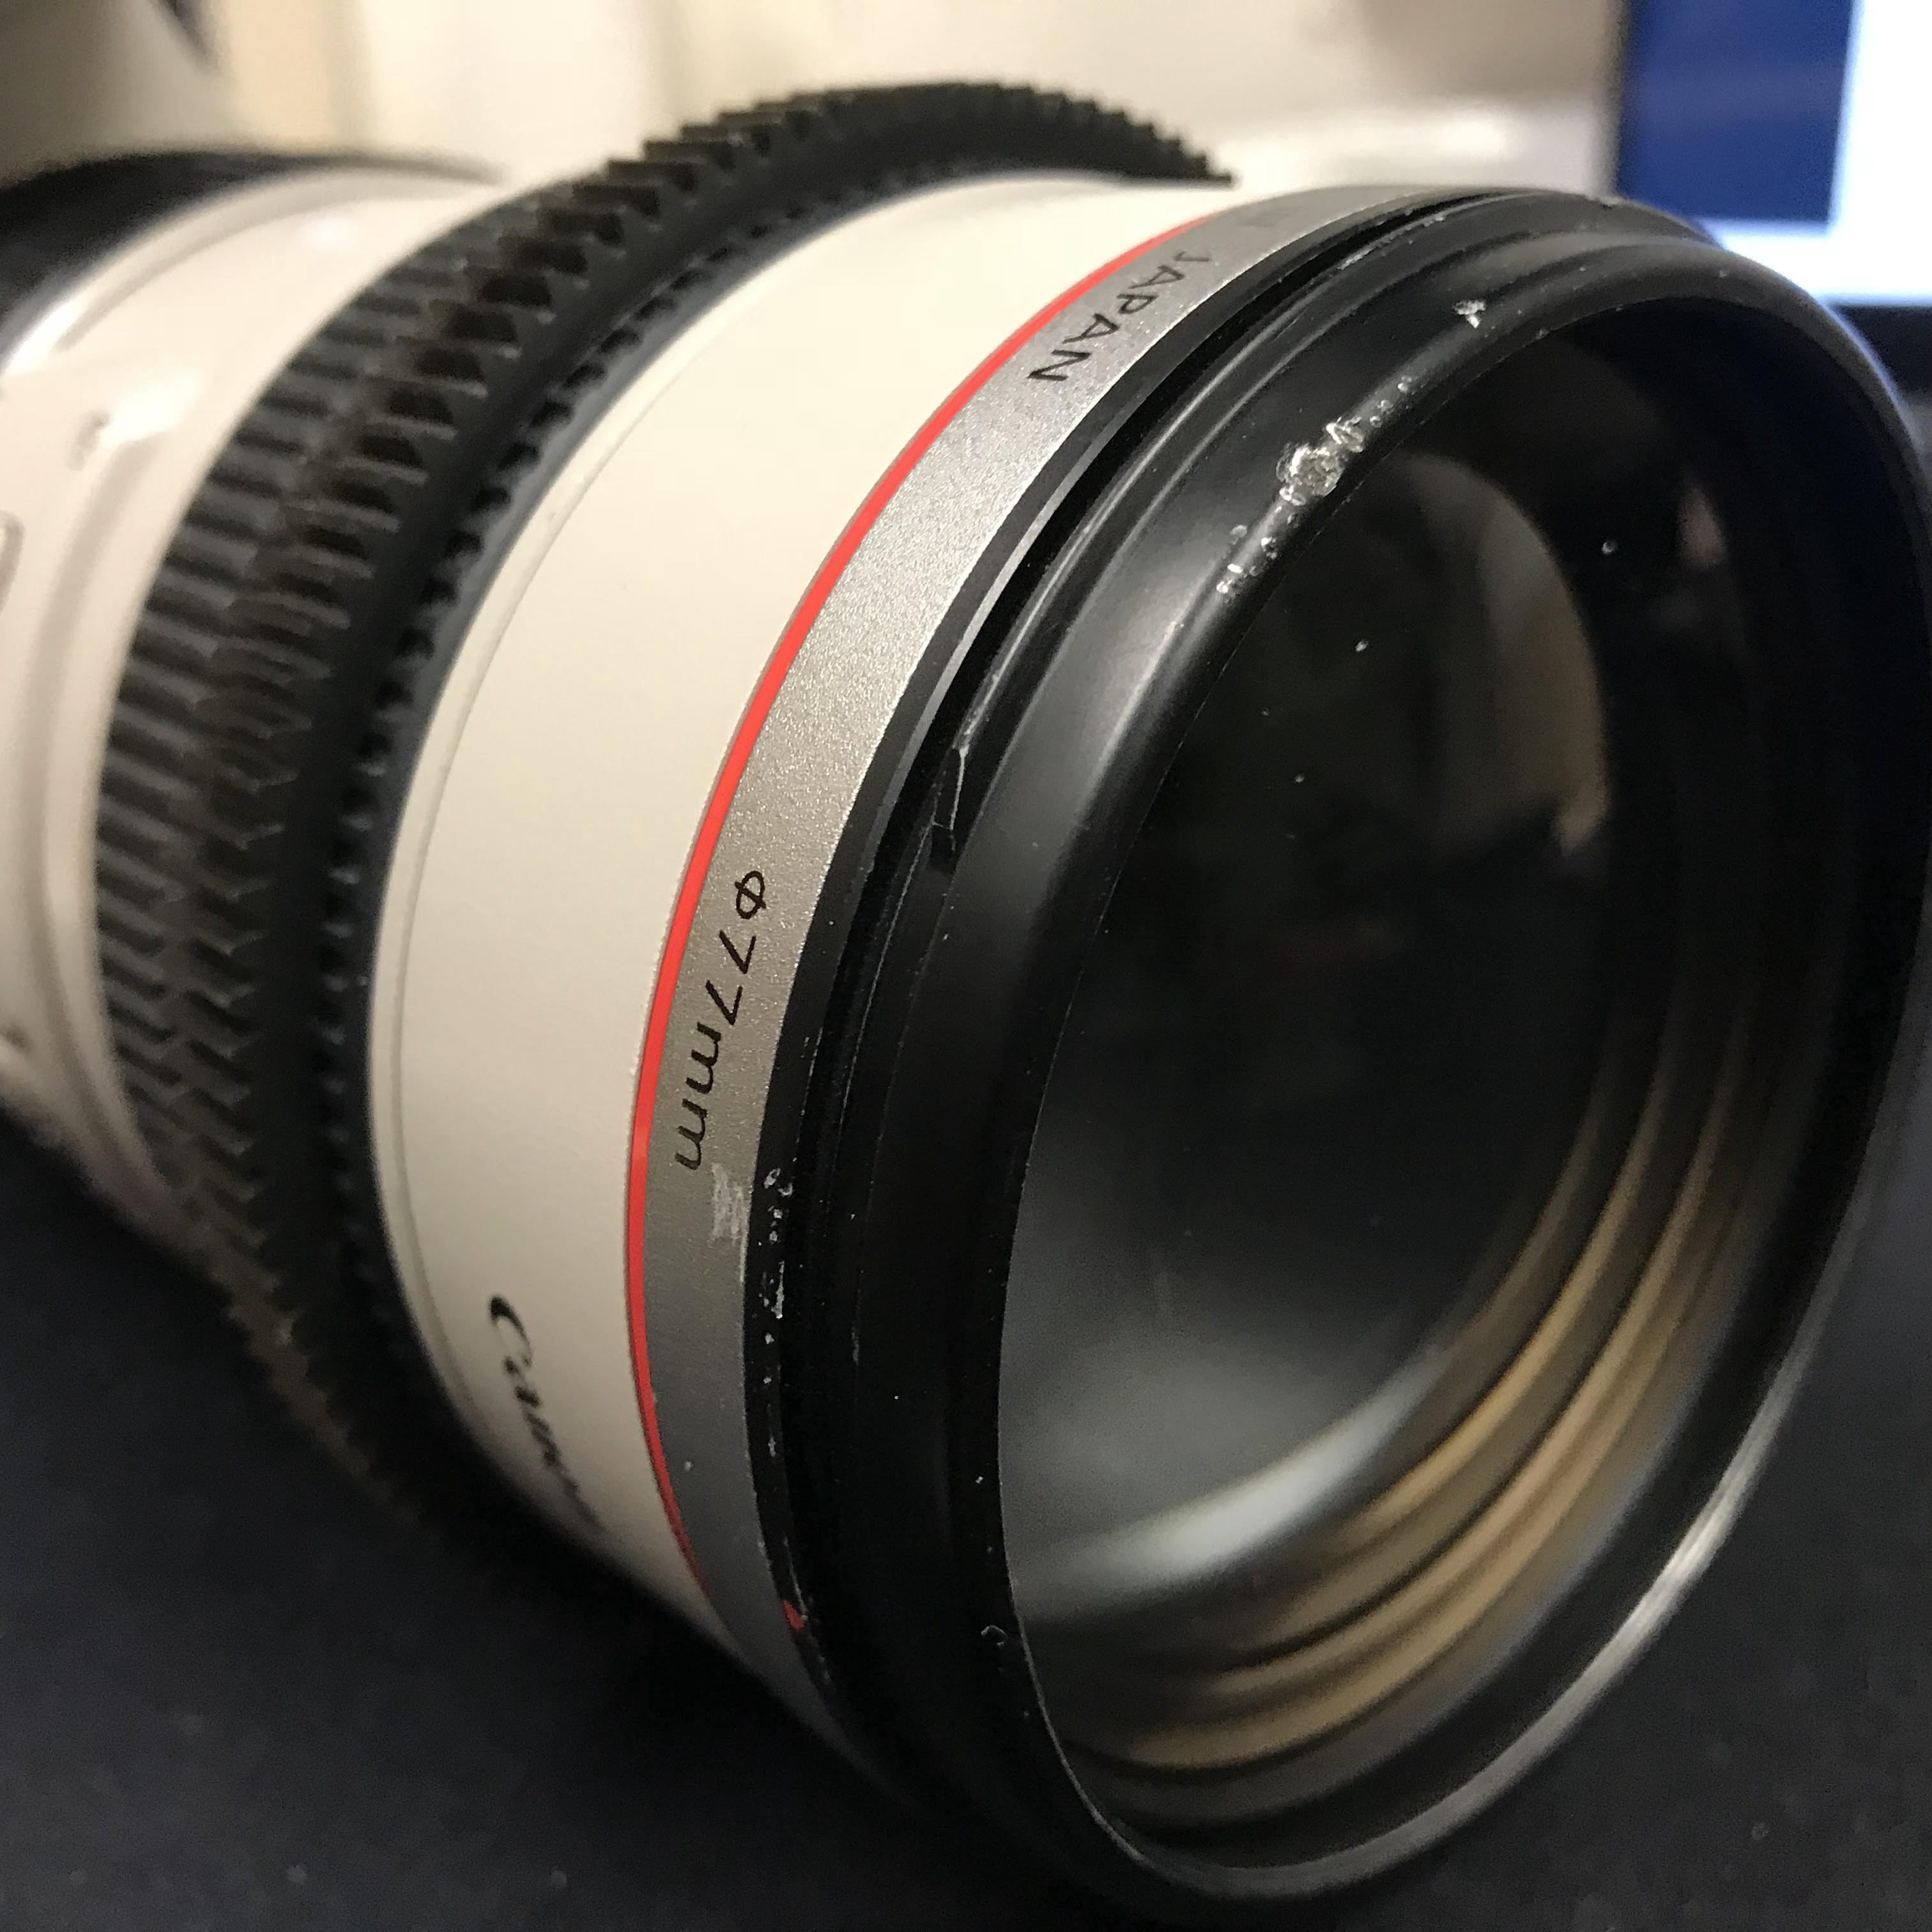 Damaged Canon 70 200mm